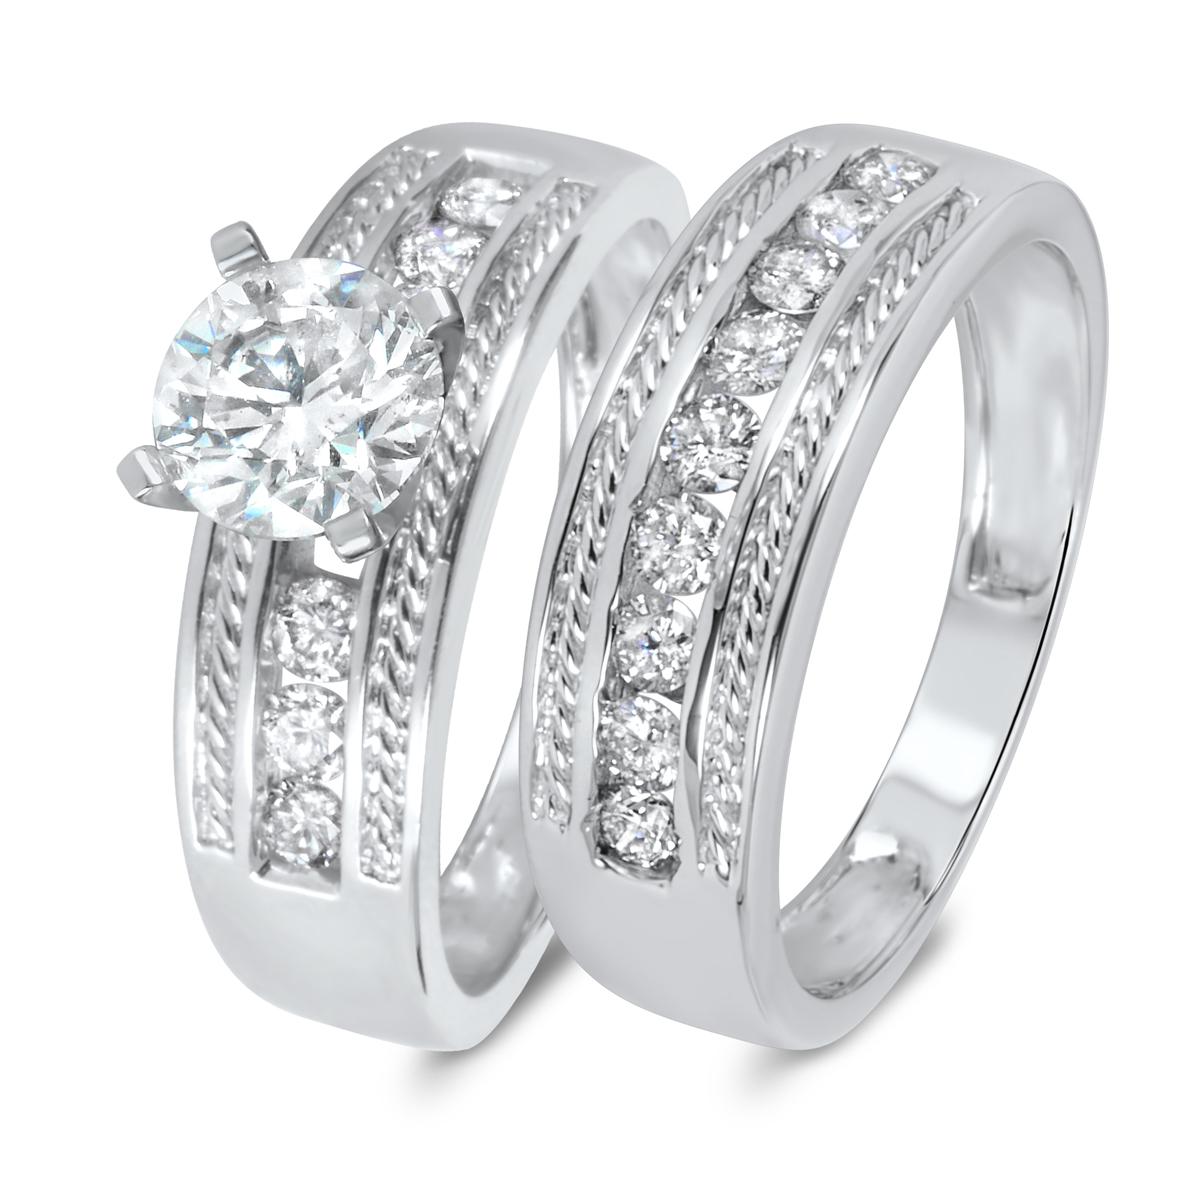 1 2/3 CT. T.W. Diamond Women's Bridal Wedding Ring Set 10K White Gold